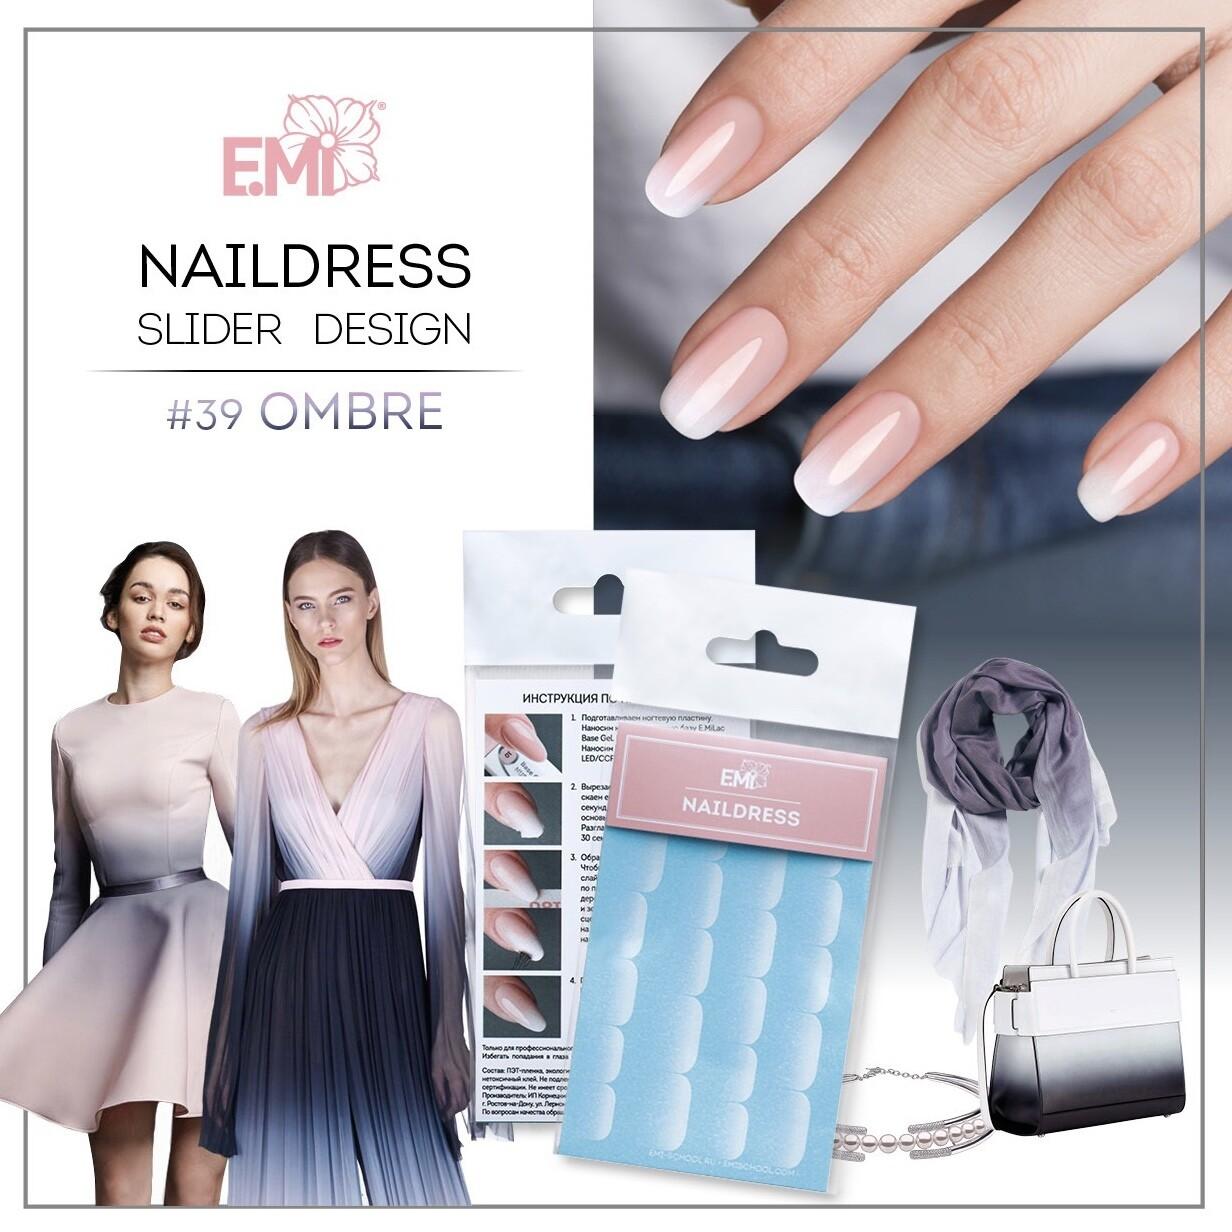 Naildress Slider Design #39 Ombre